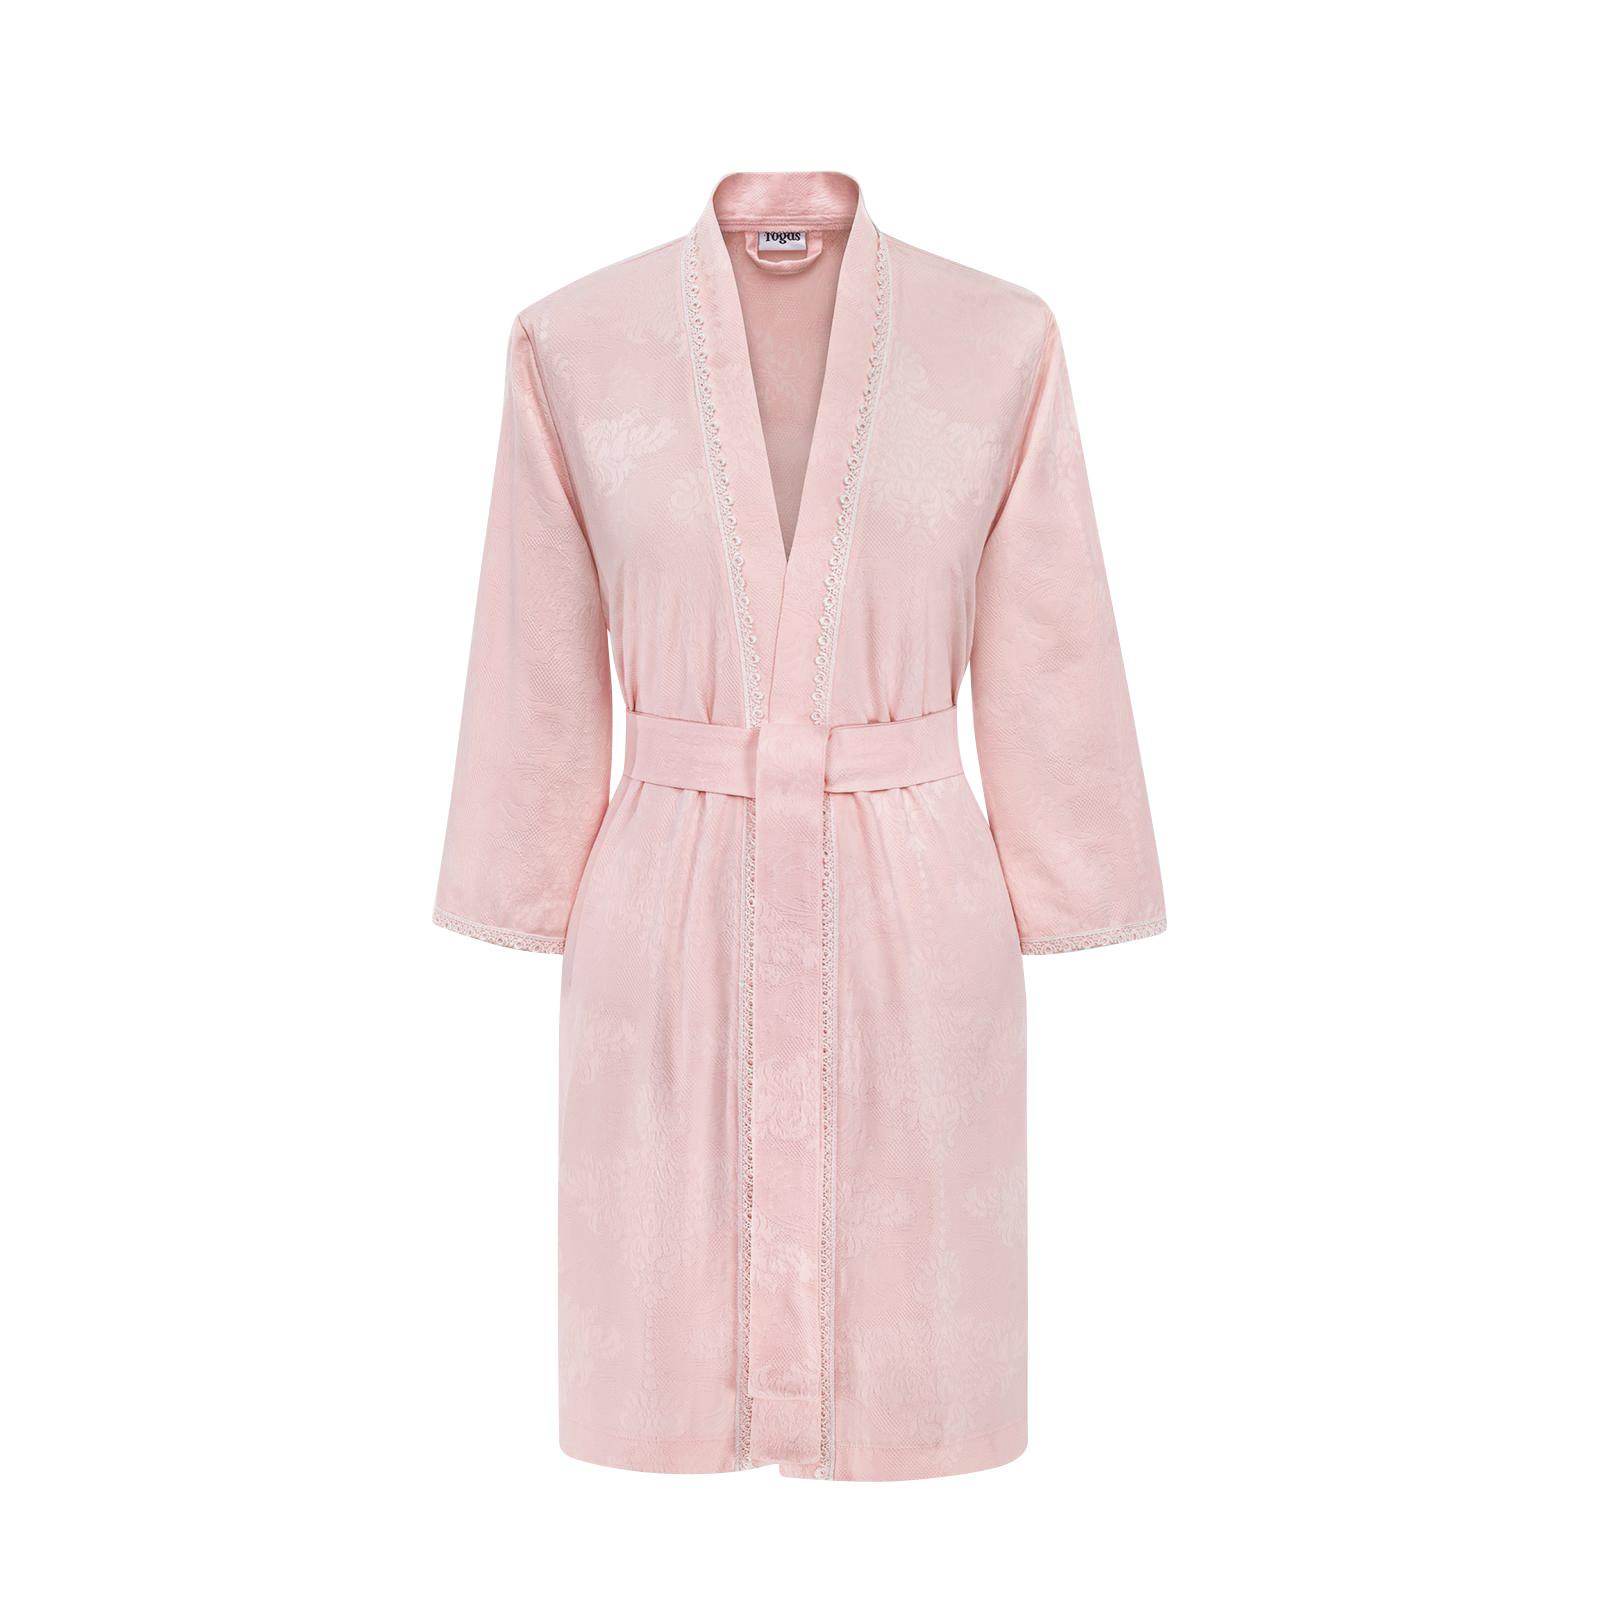 Фото - Халат Togas Дорис светло-розовый l /48/ коврик для ванной togas дорис розовое 60x90